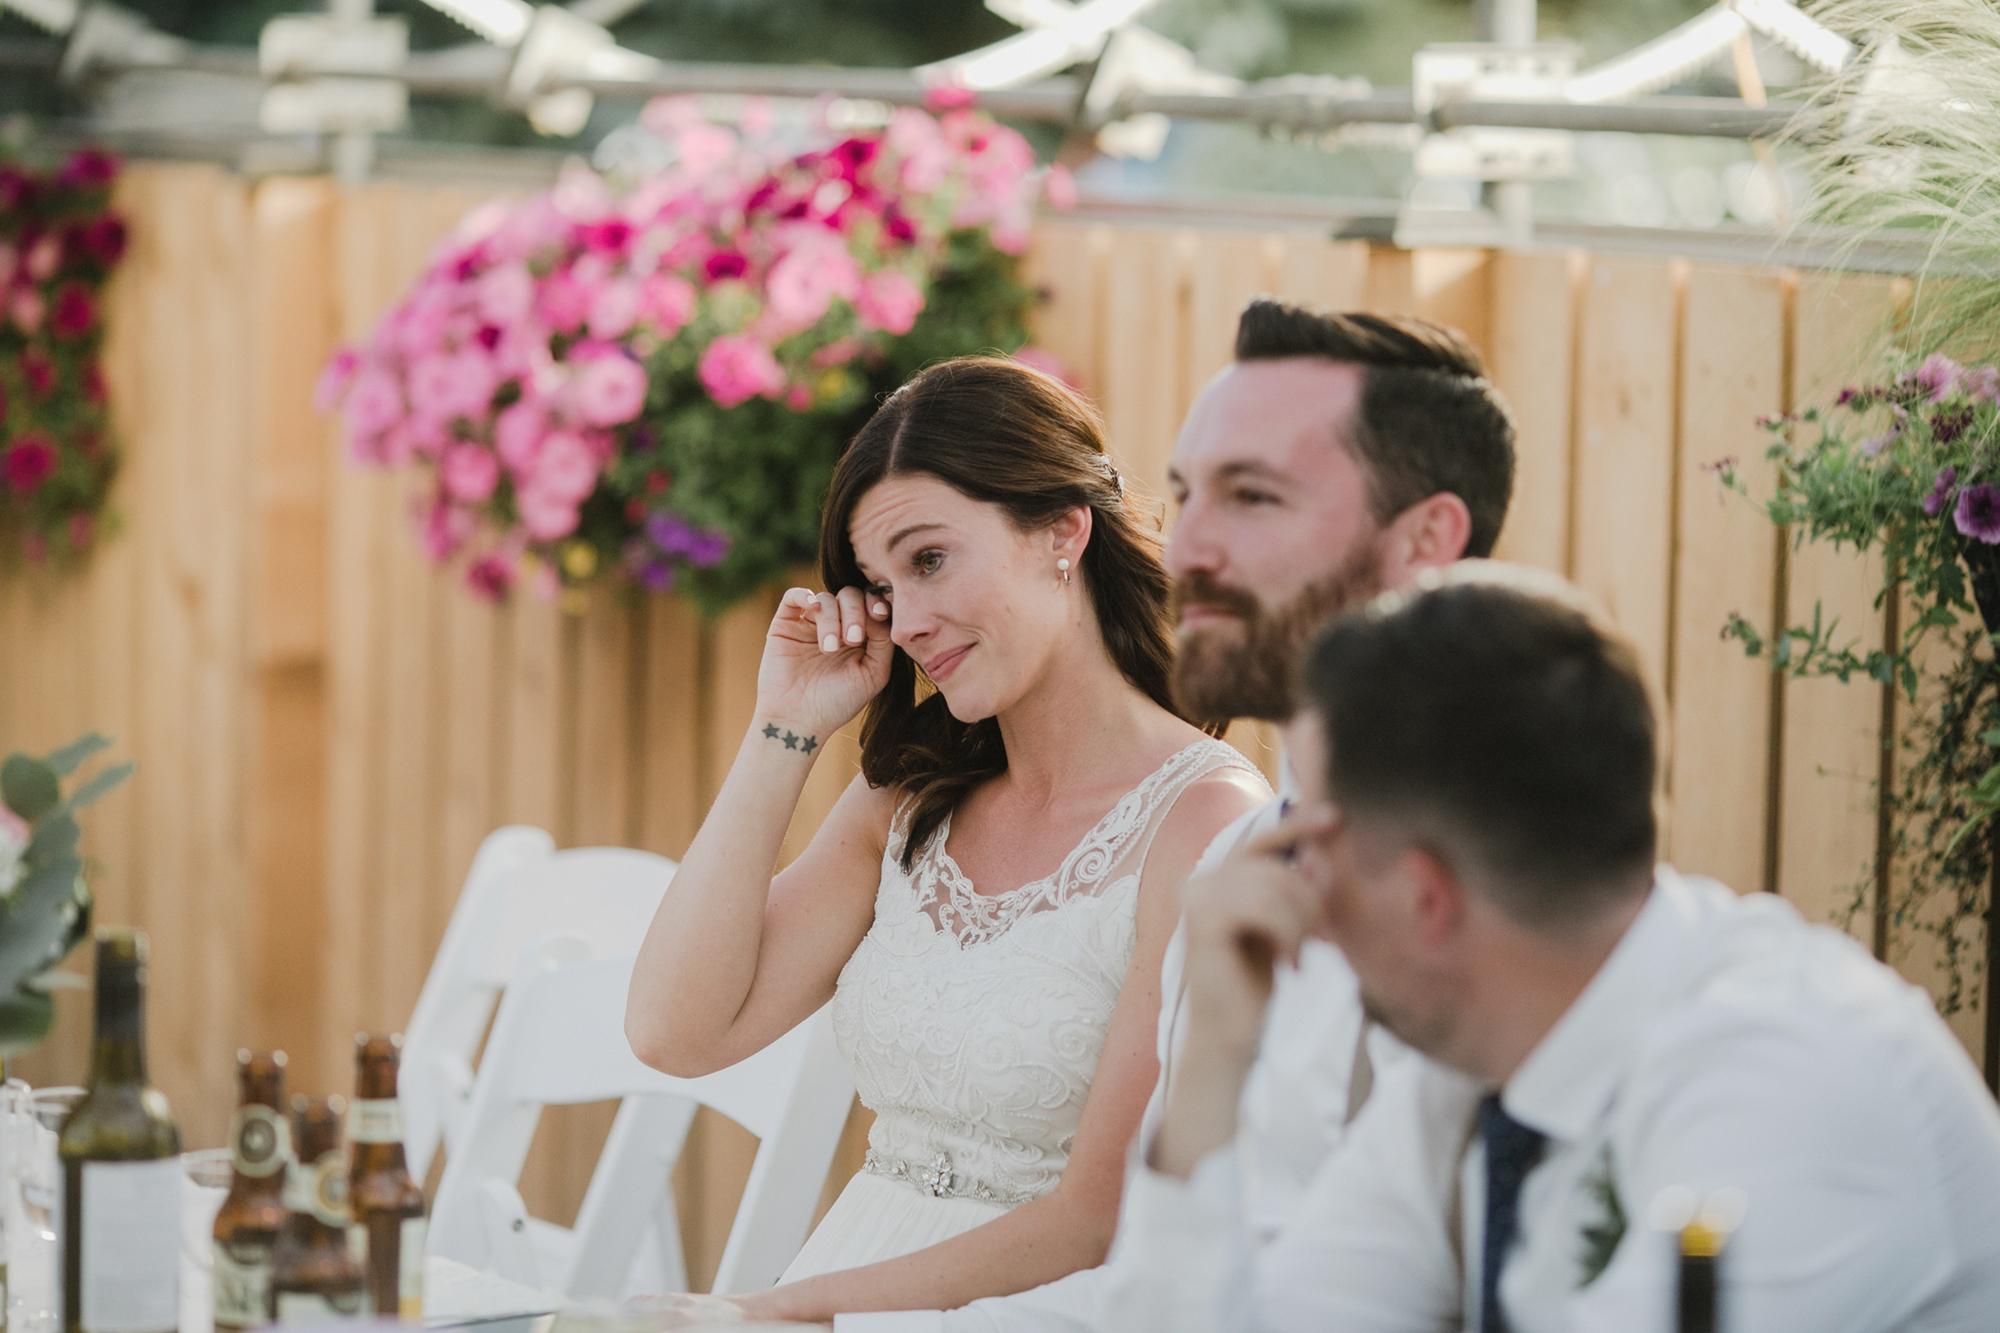 Flower Farm Crowsnest Pass Wedding -067.JPG